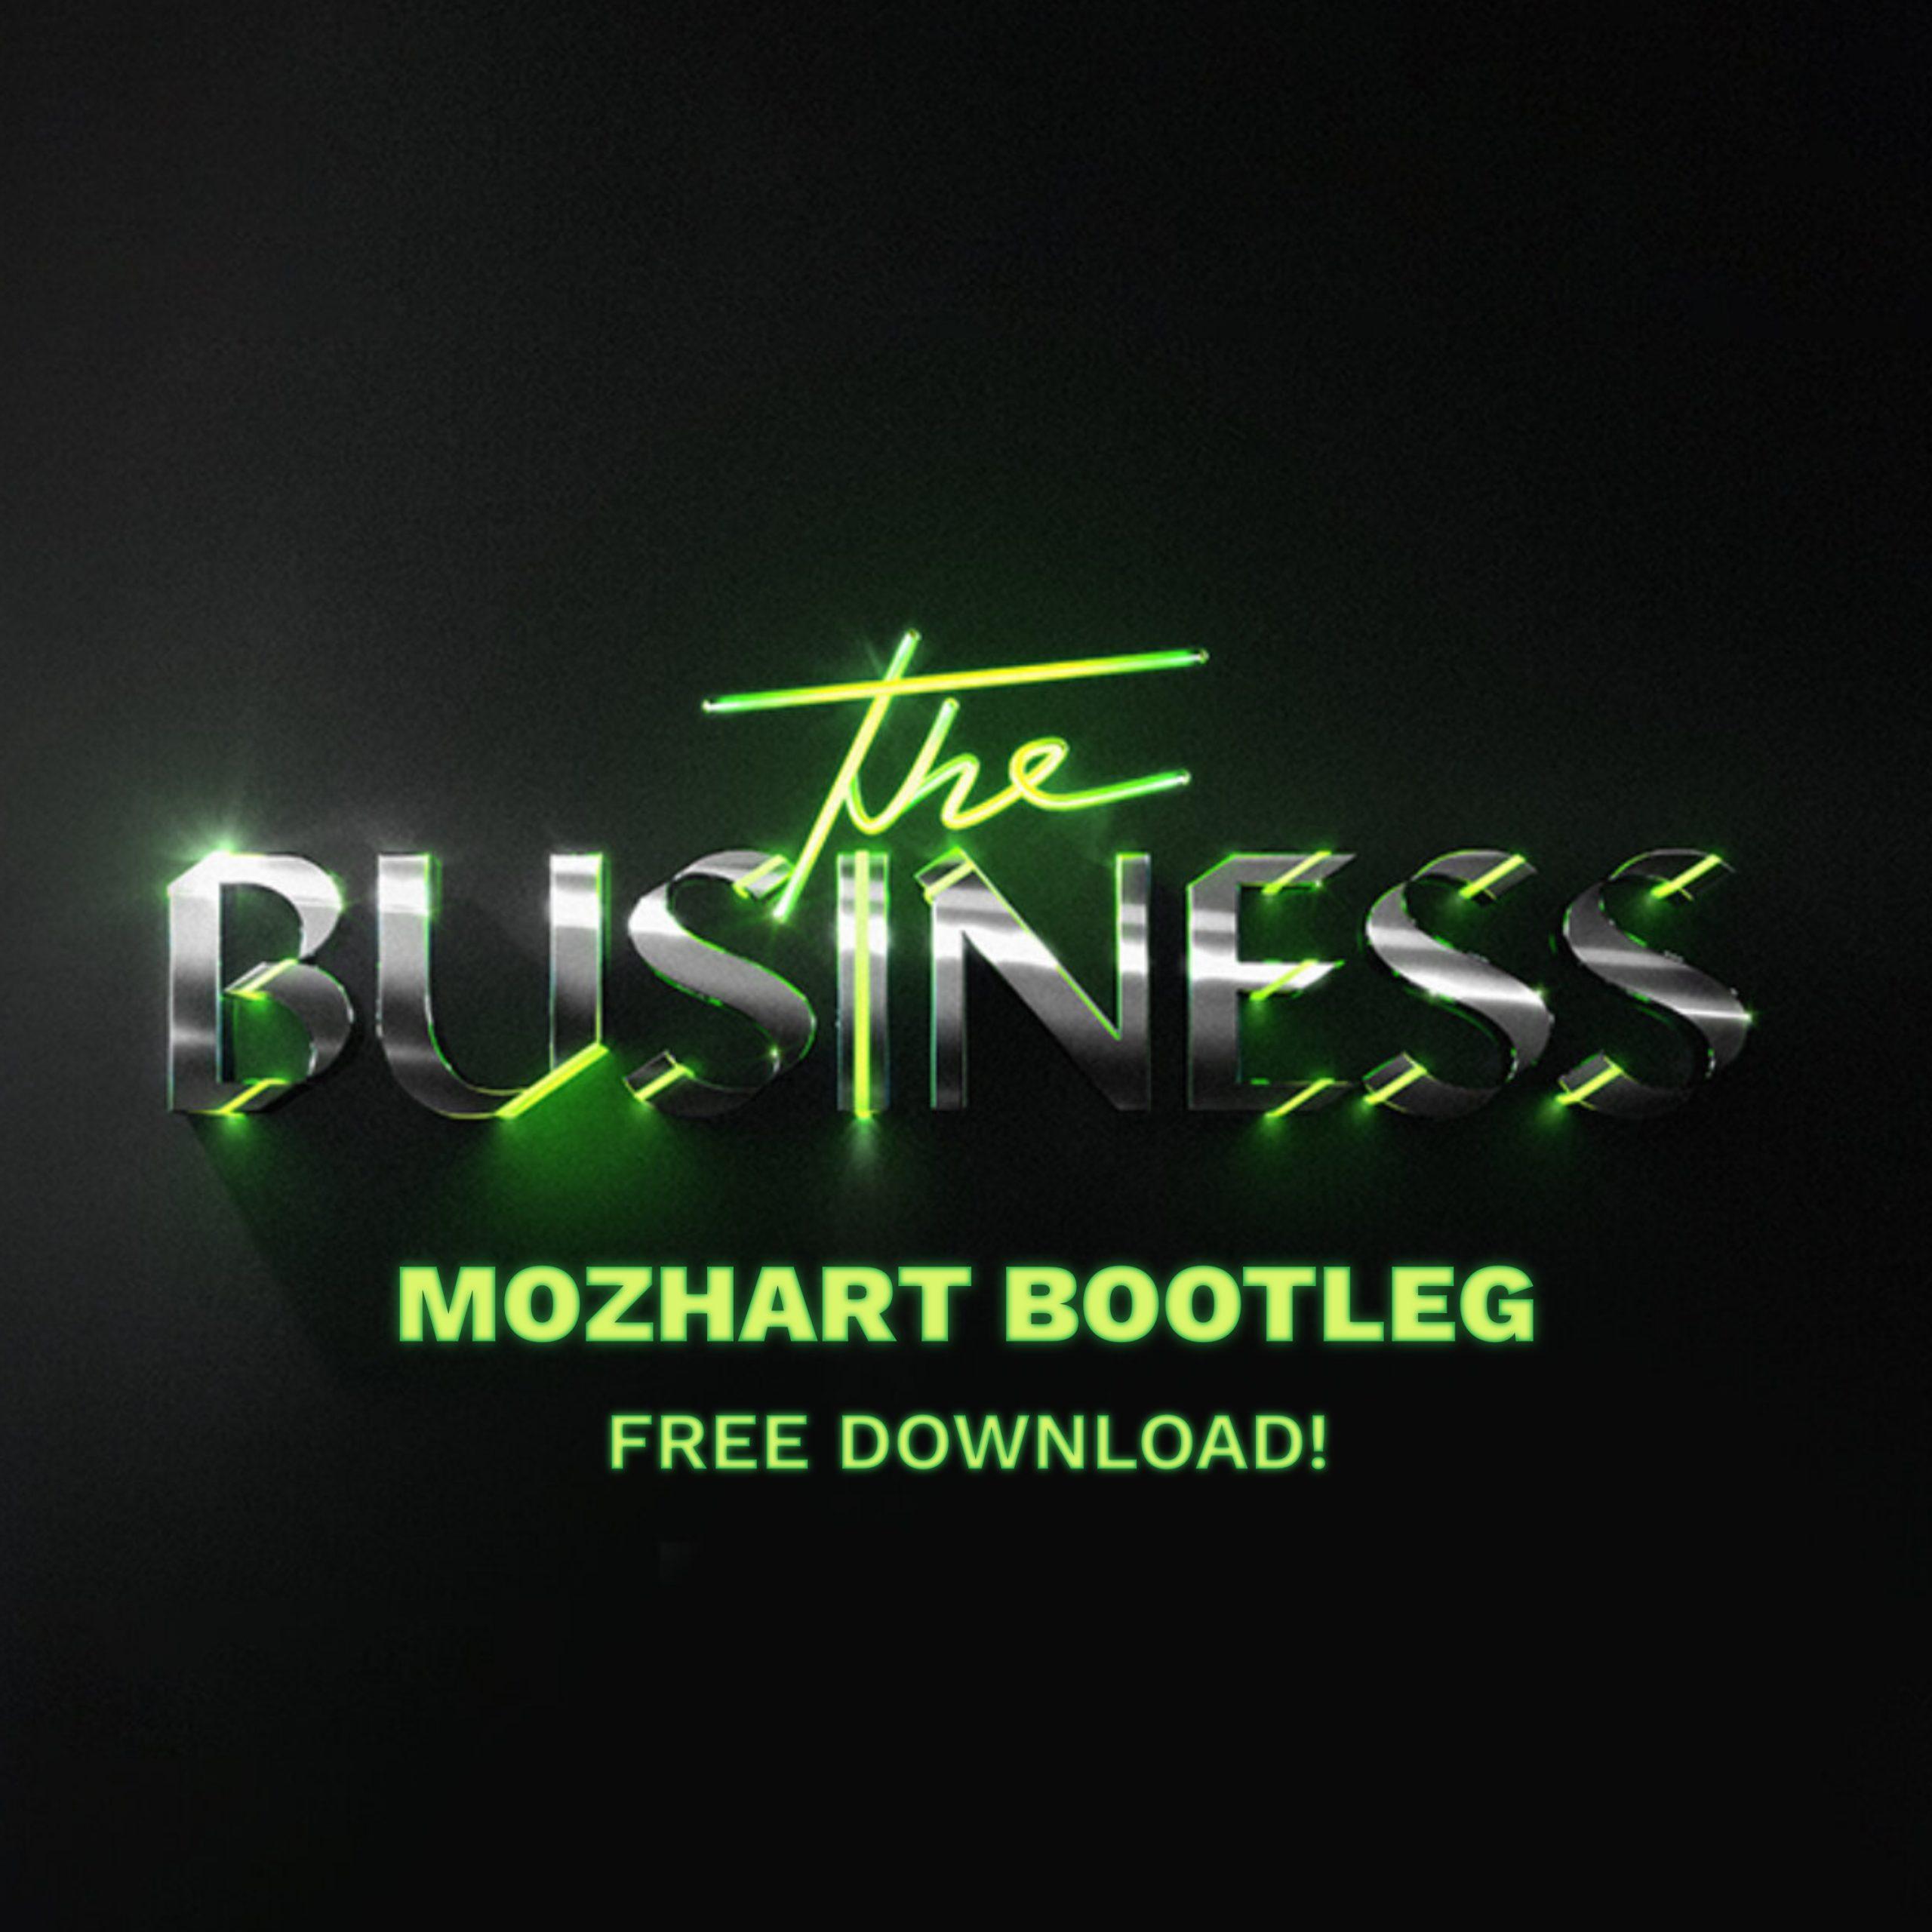 Tiesto – The Business (Mozhart Bootleg) Cover 1-1 v2